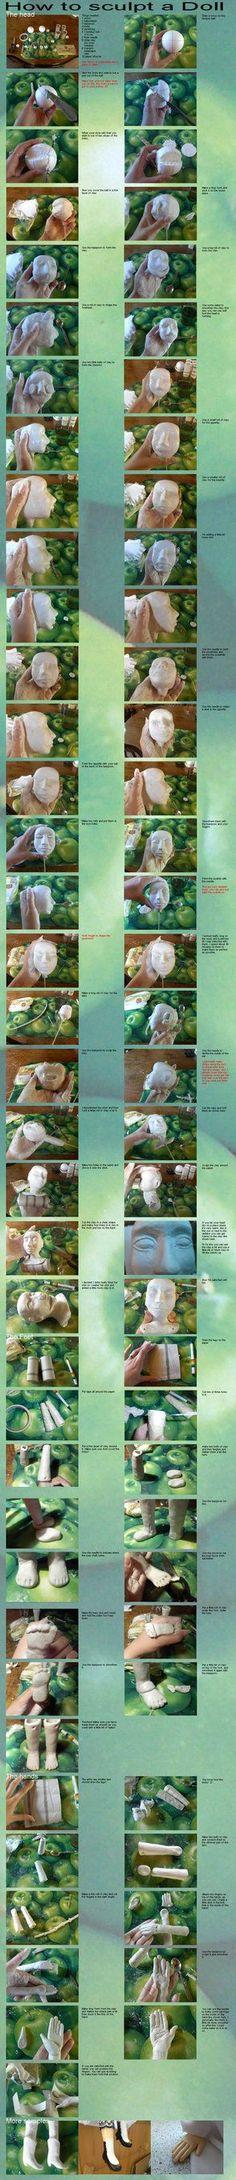 How to sculpt a doll-tutorial- by ~Hamkaastostie on deviantART  clay over styrofoam: